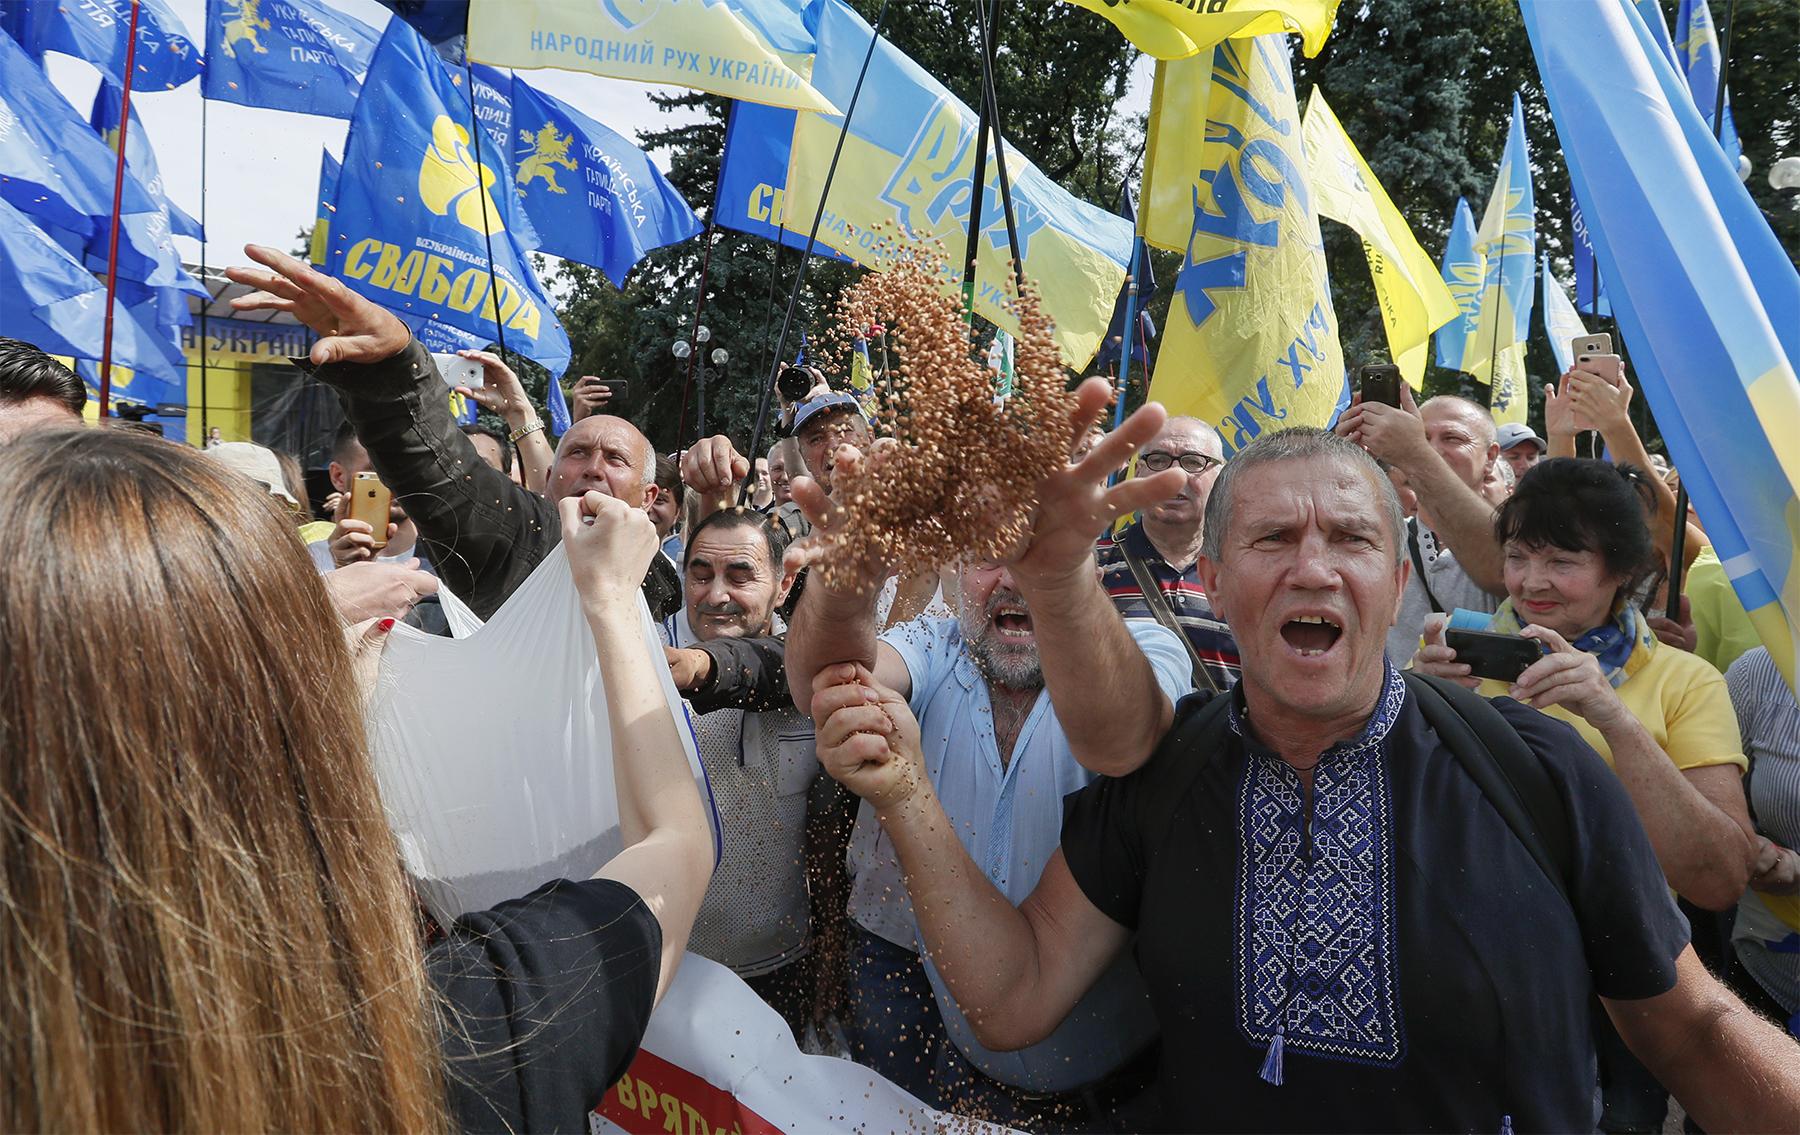 Ukraine launches election campaign to the Verkhovna Rada 27.07.2012 28